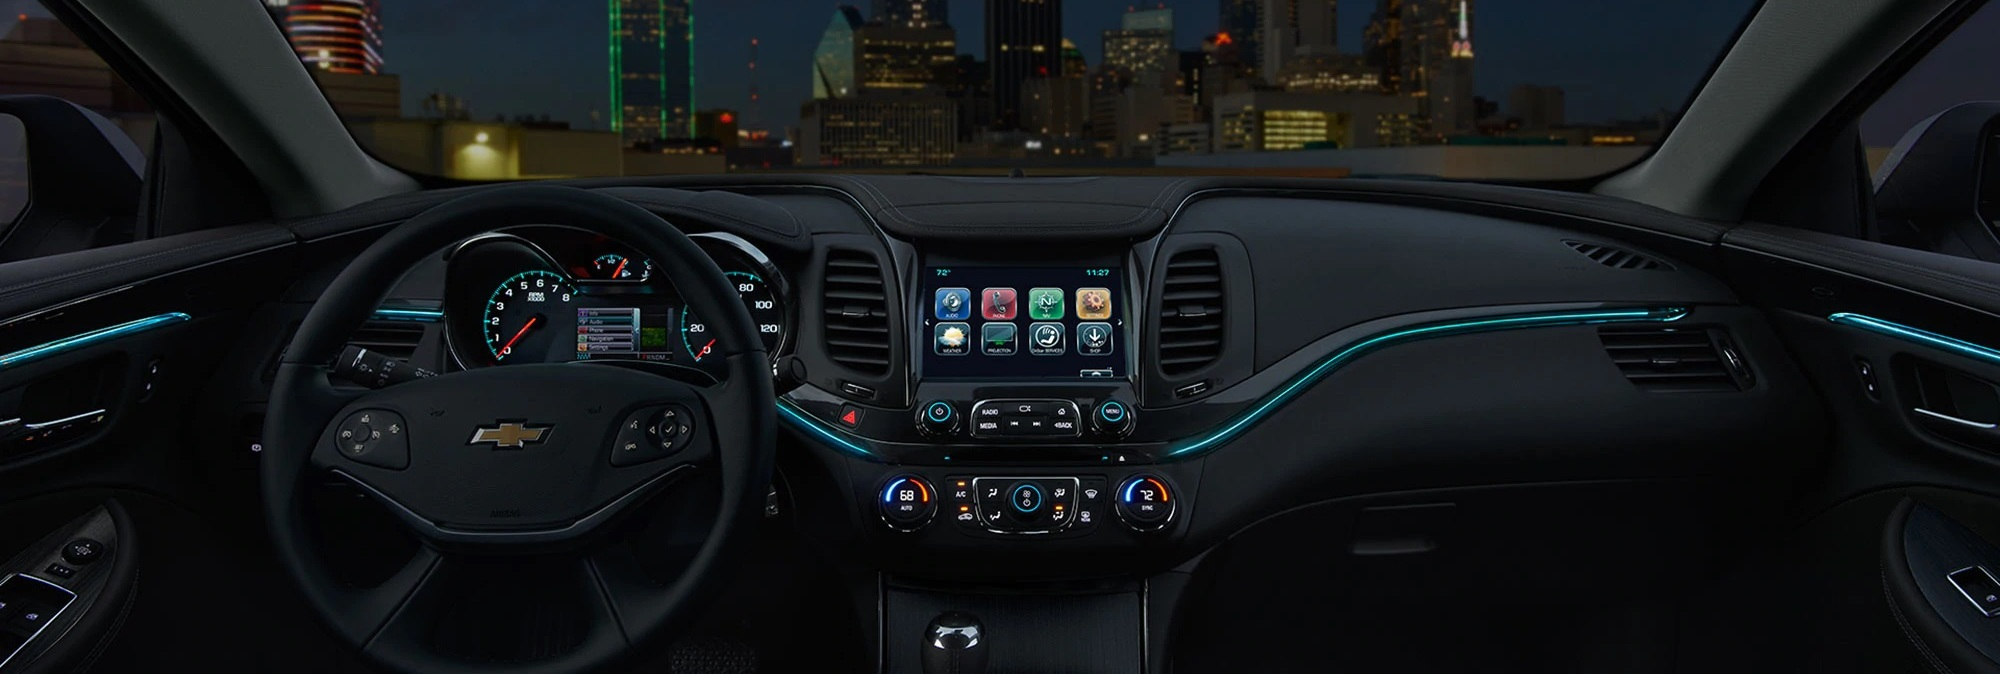 2020 Chevrolet Impala Dashboard